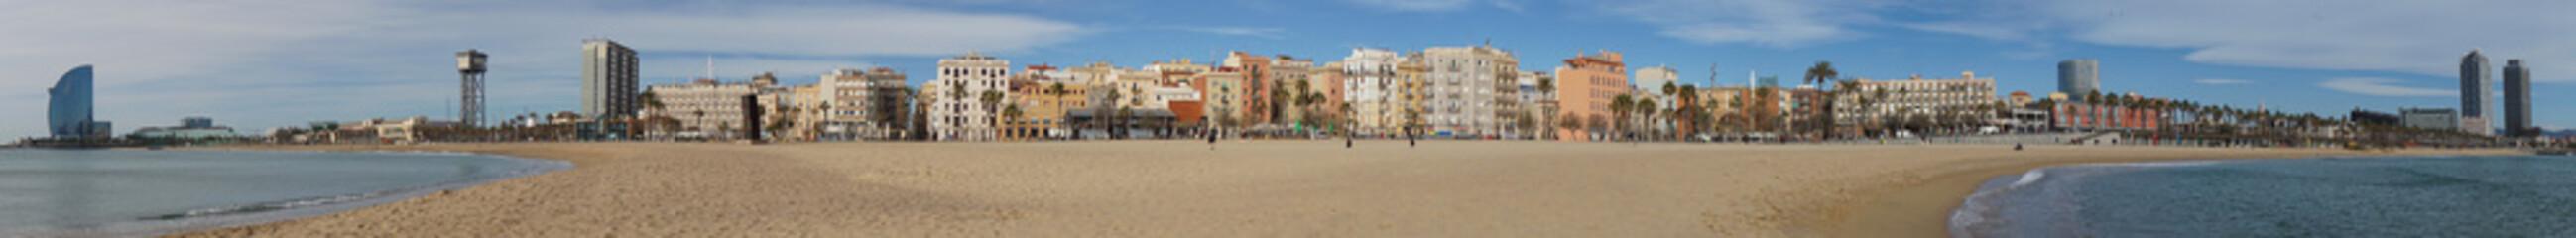 panoramic view of Barcelona cityscape skyline as seen from Barceloneta beach                                Fototapete